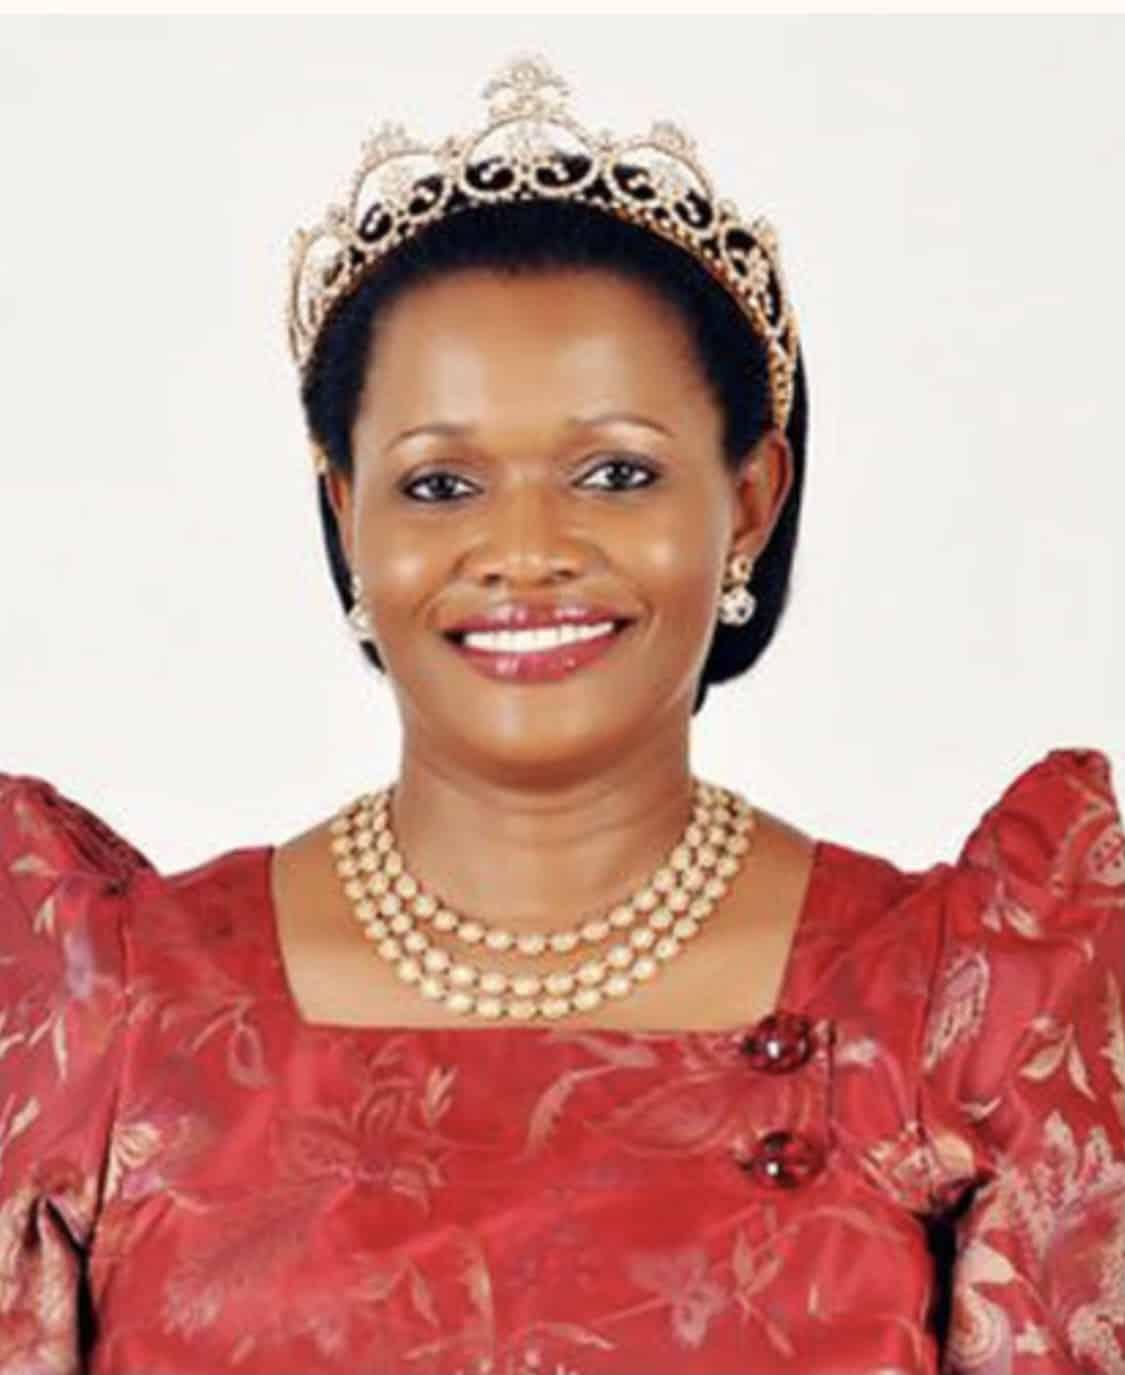 Nabagereka of Buganda Kingdom HRH Queen Sylvia Nagginda